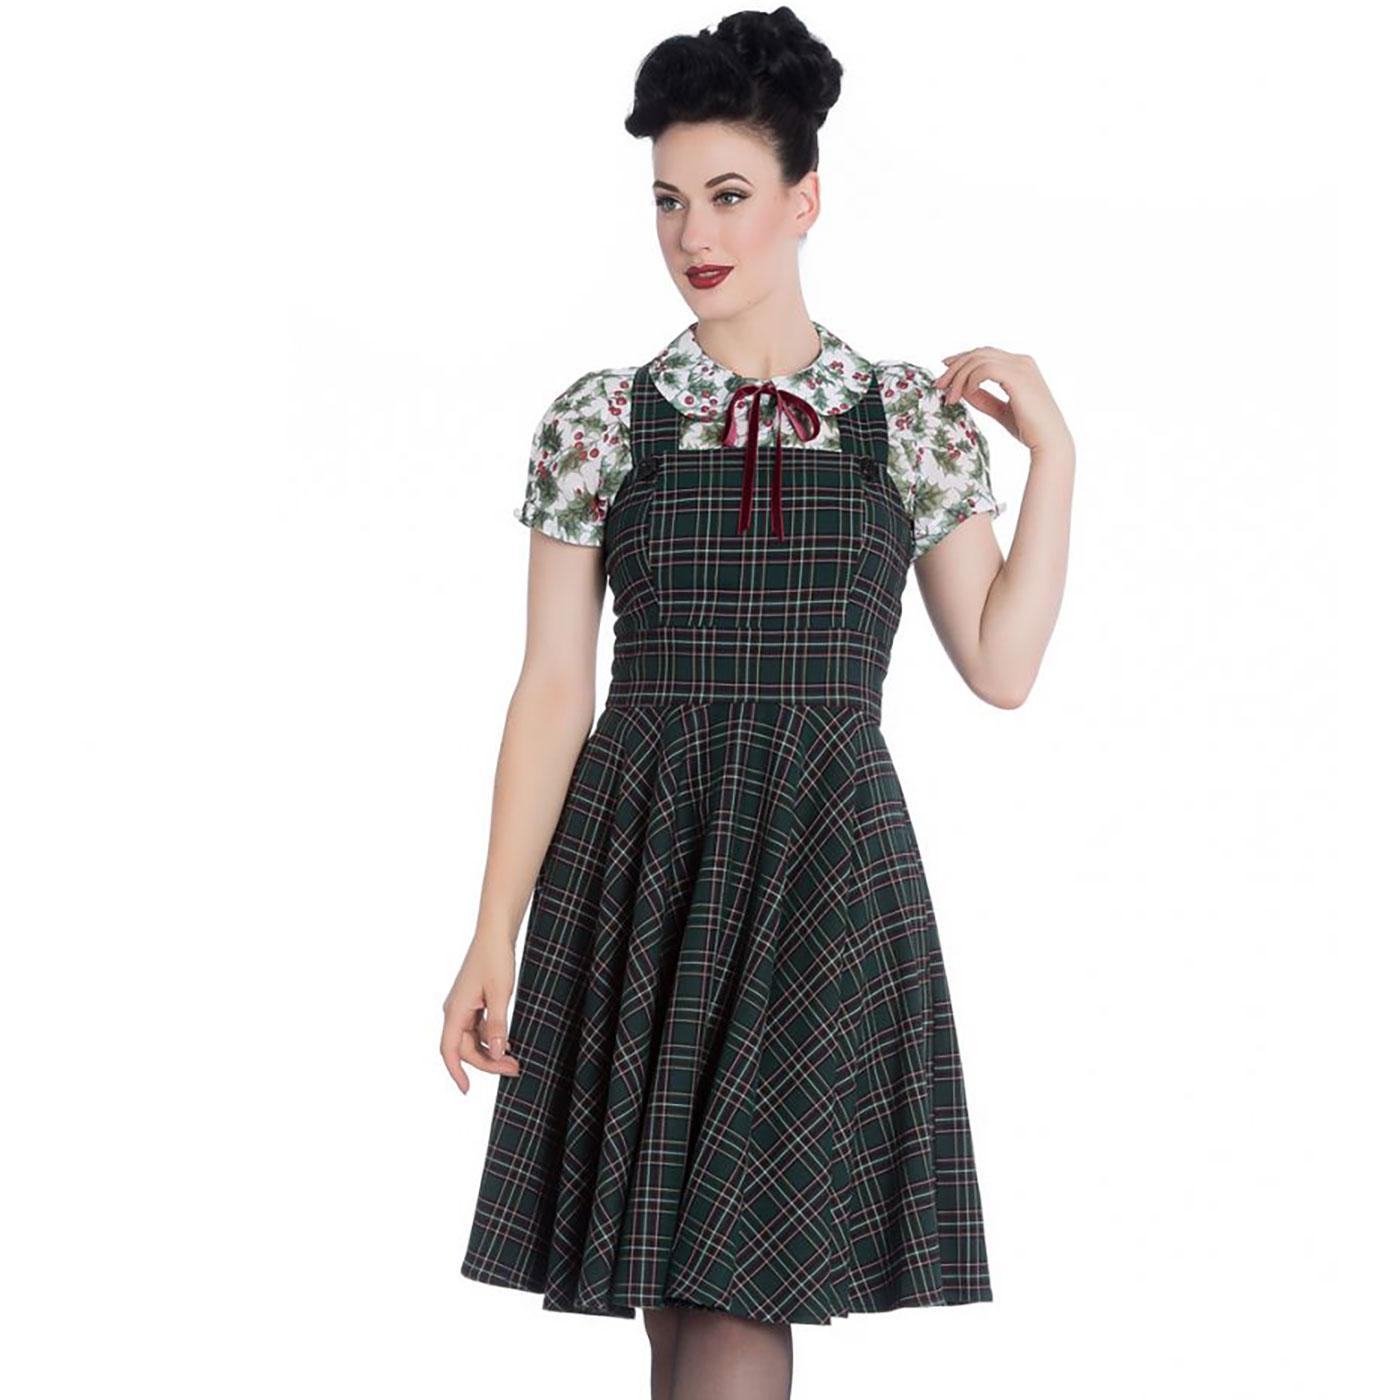 Peebles HELL BUNNY Tartan Pinafore Dress GREEN